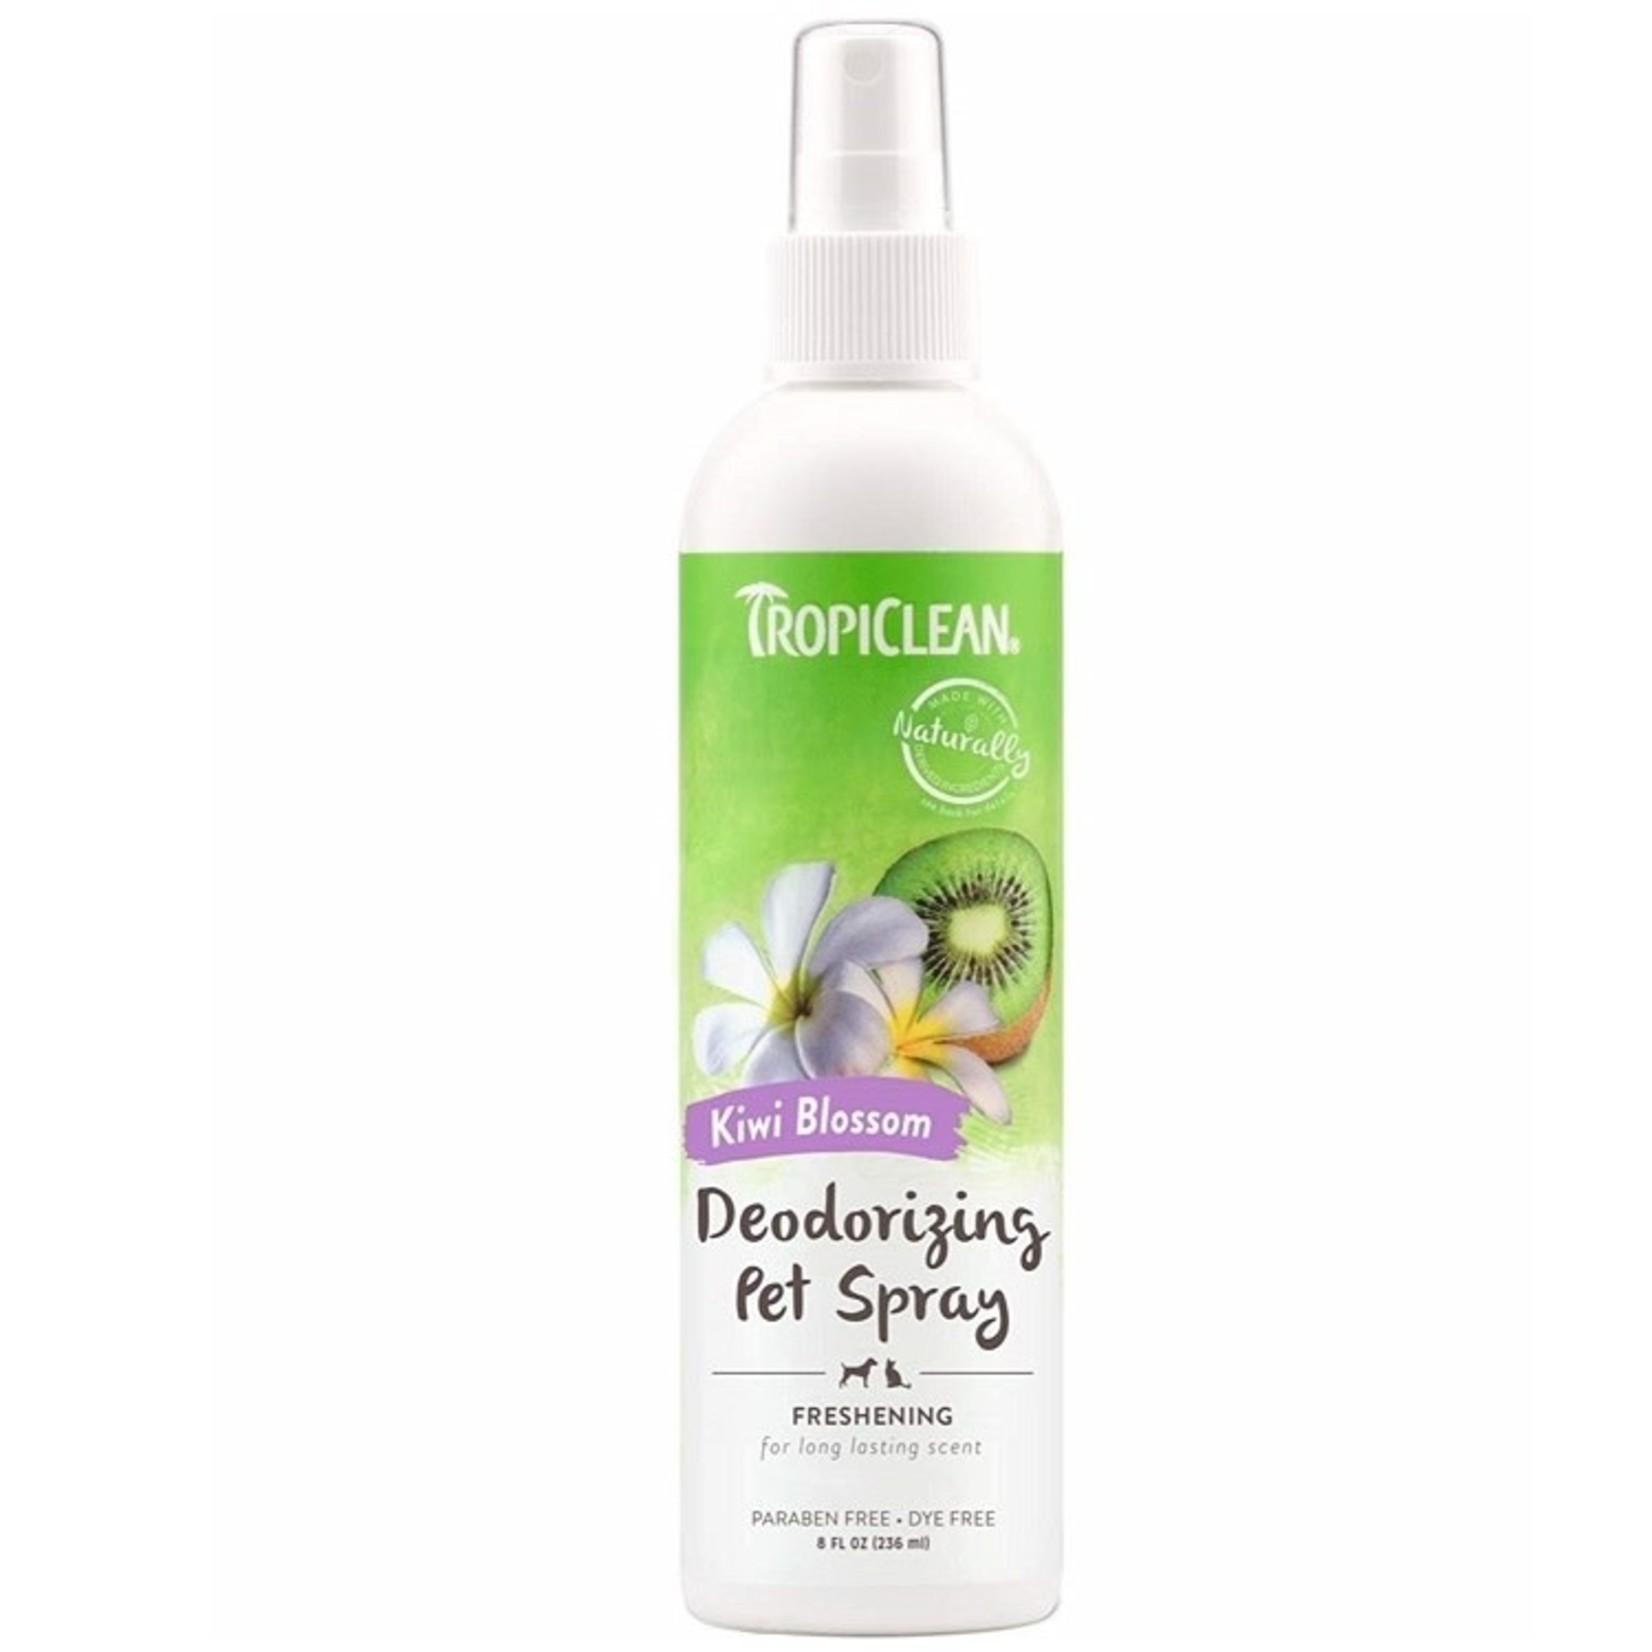 Kiwi Blossom Deodorizing Pet Spray